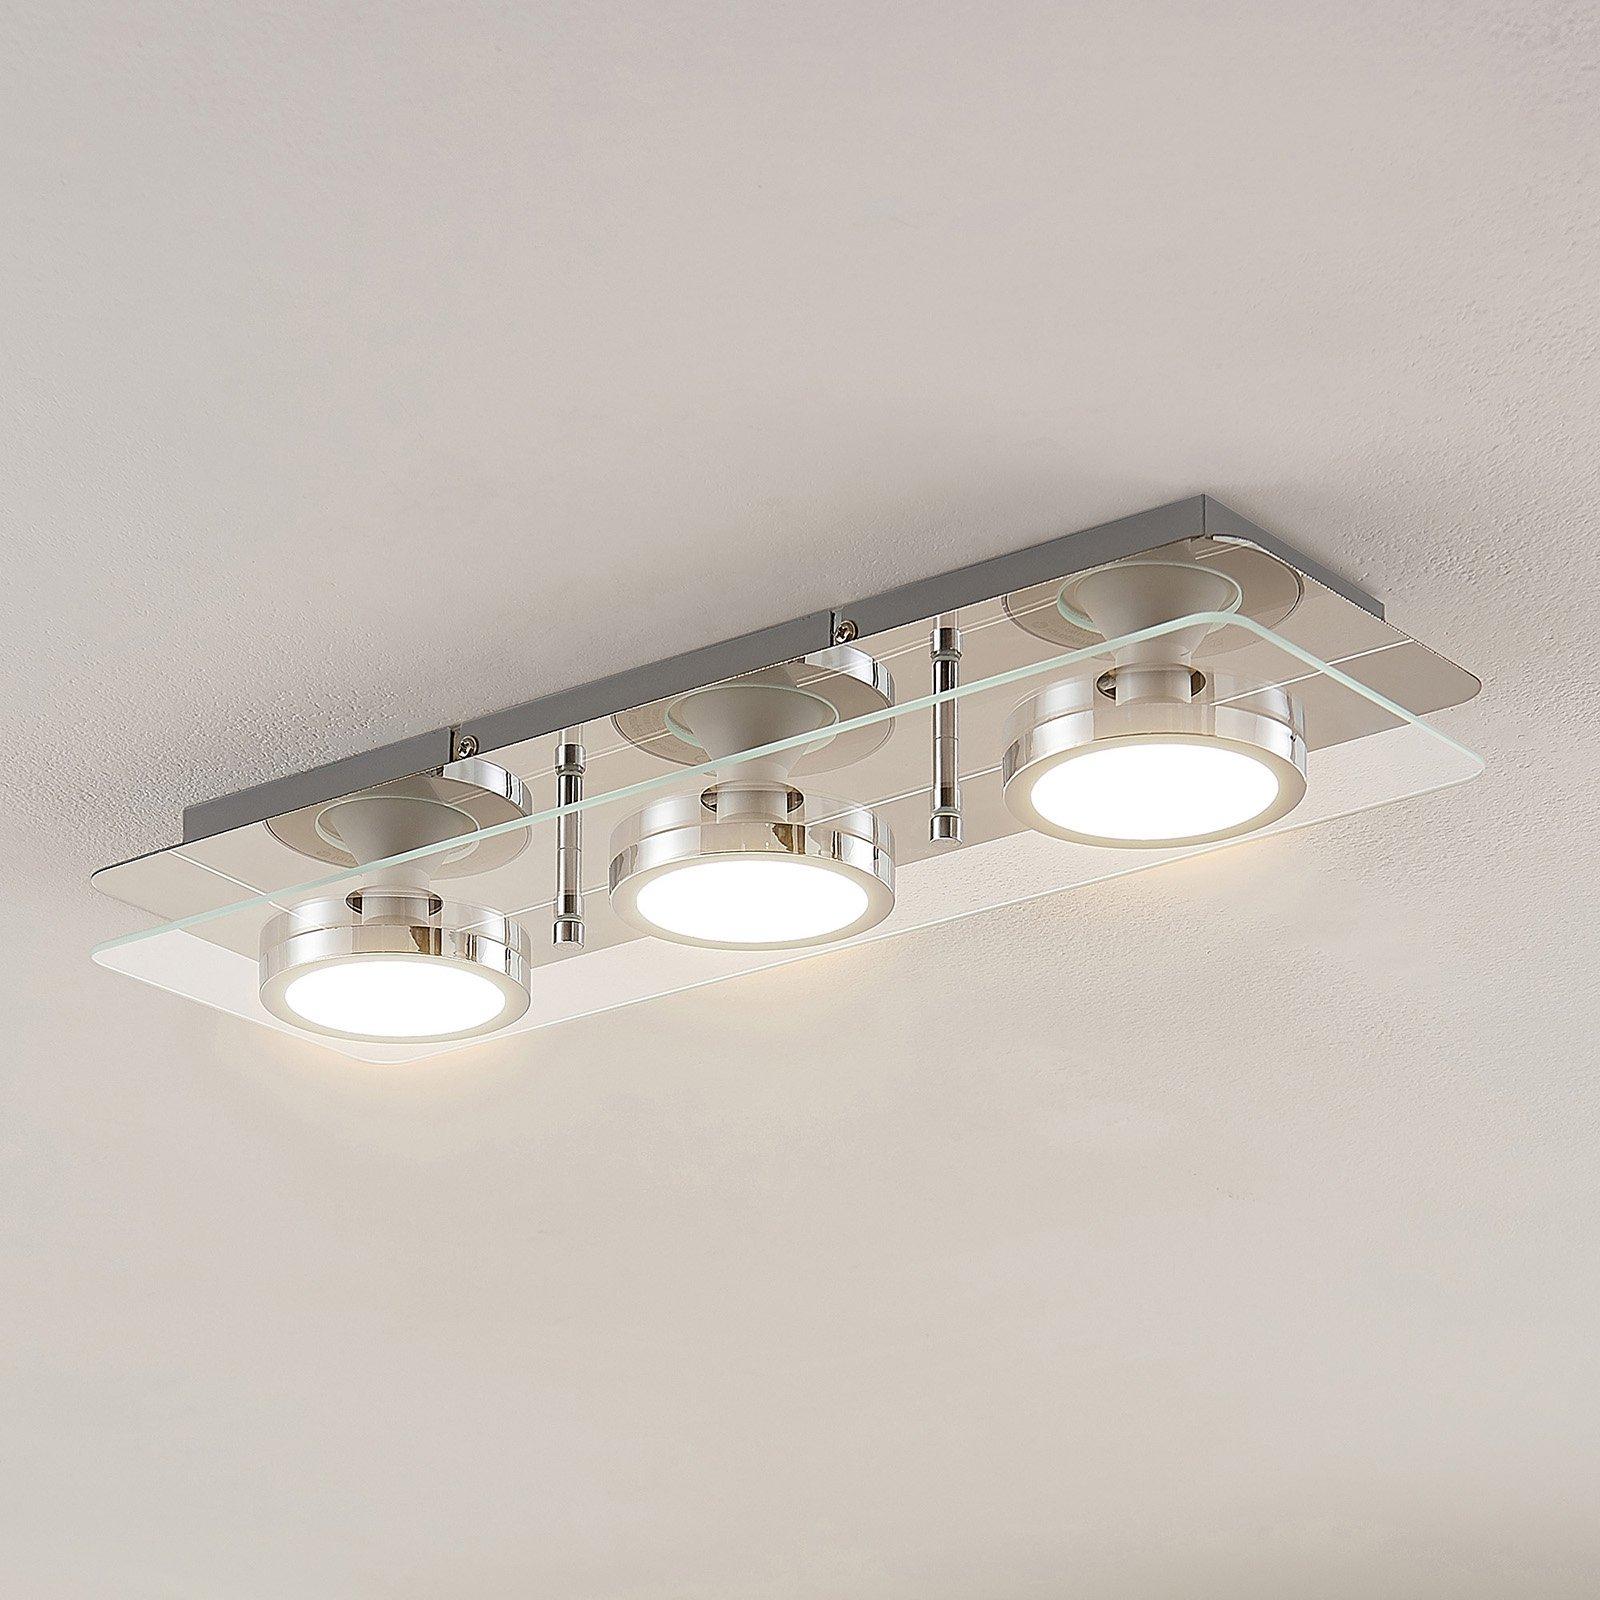 Lindby Gabryl LED-taklampe, tre lyskilderr, lang